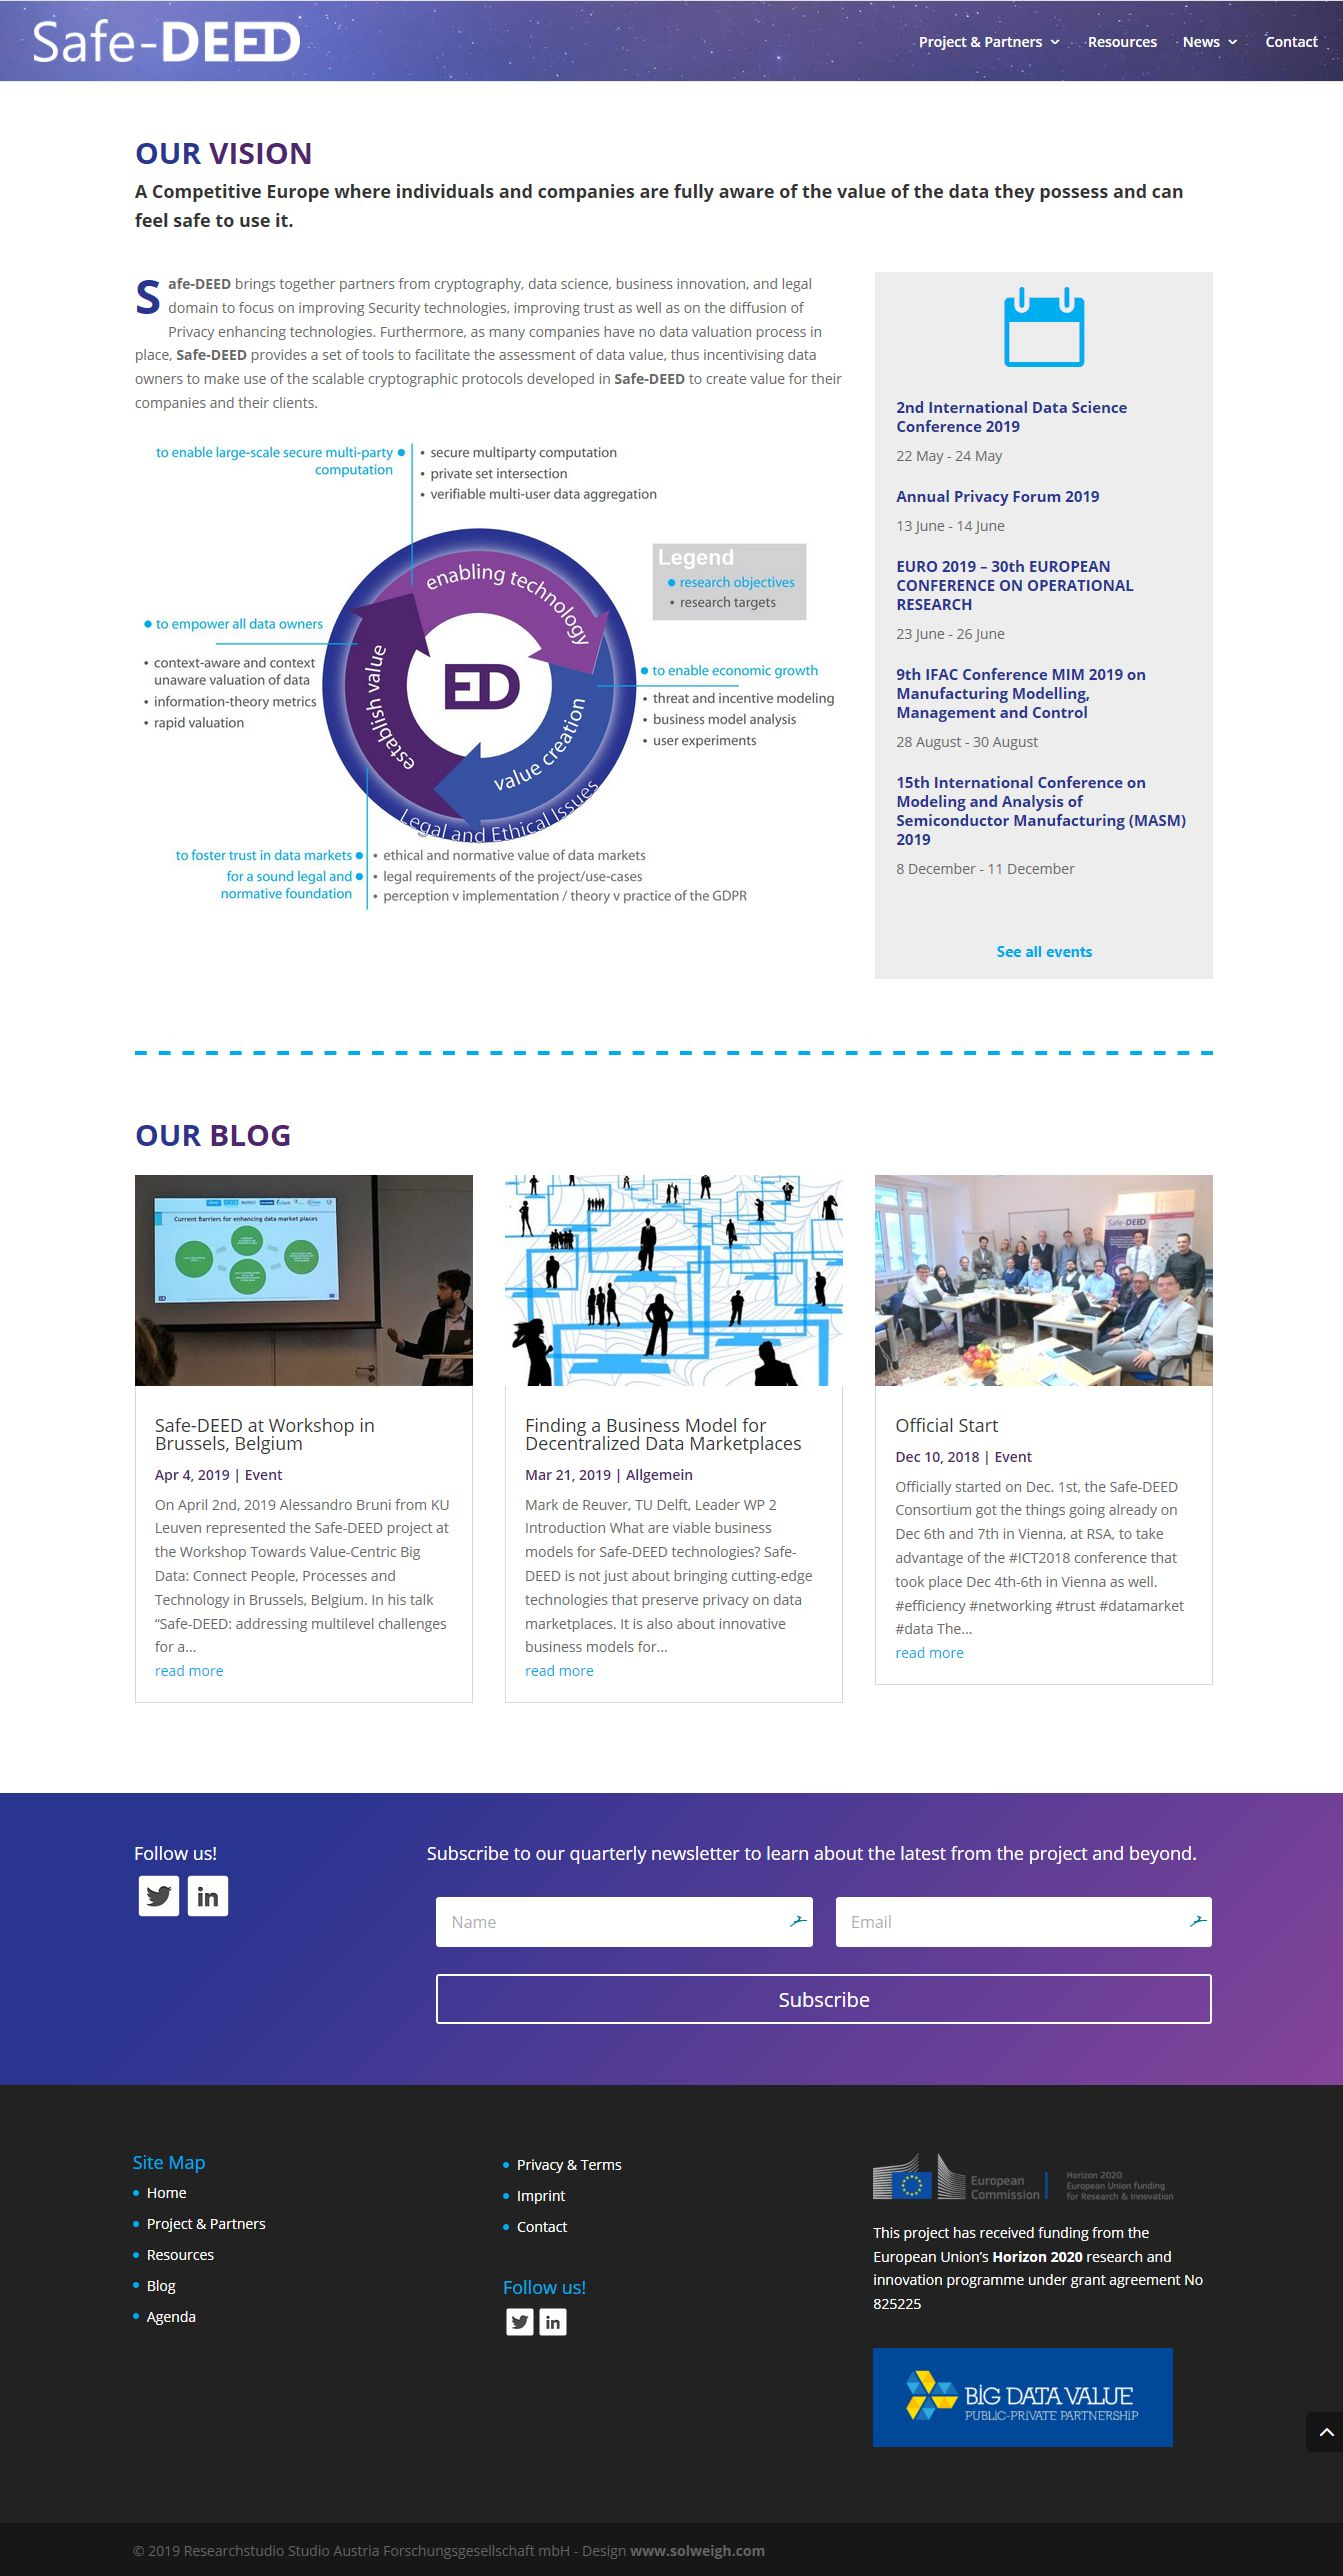 Safe Deed Website Webdesign H2020 Horizon 2020 Project Europe